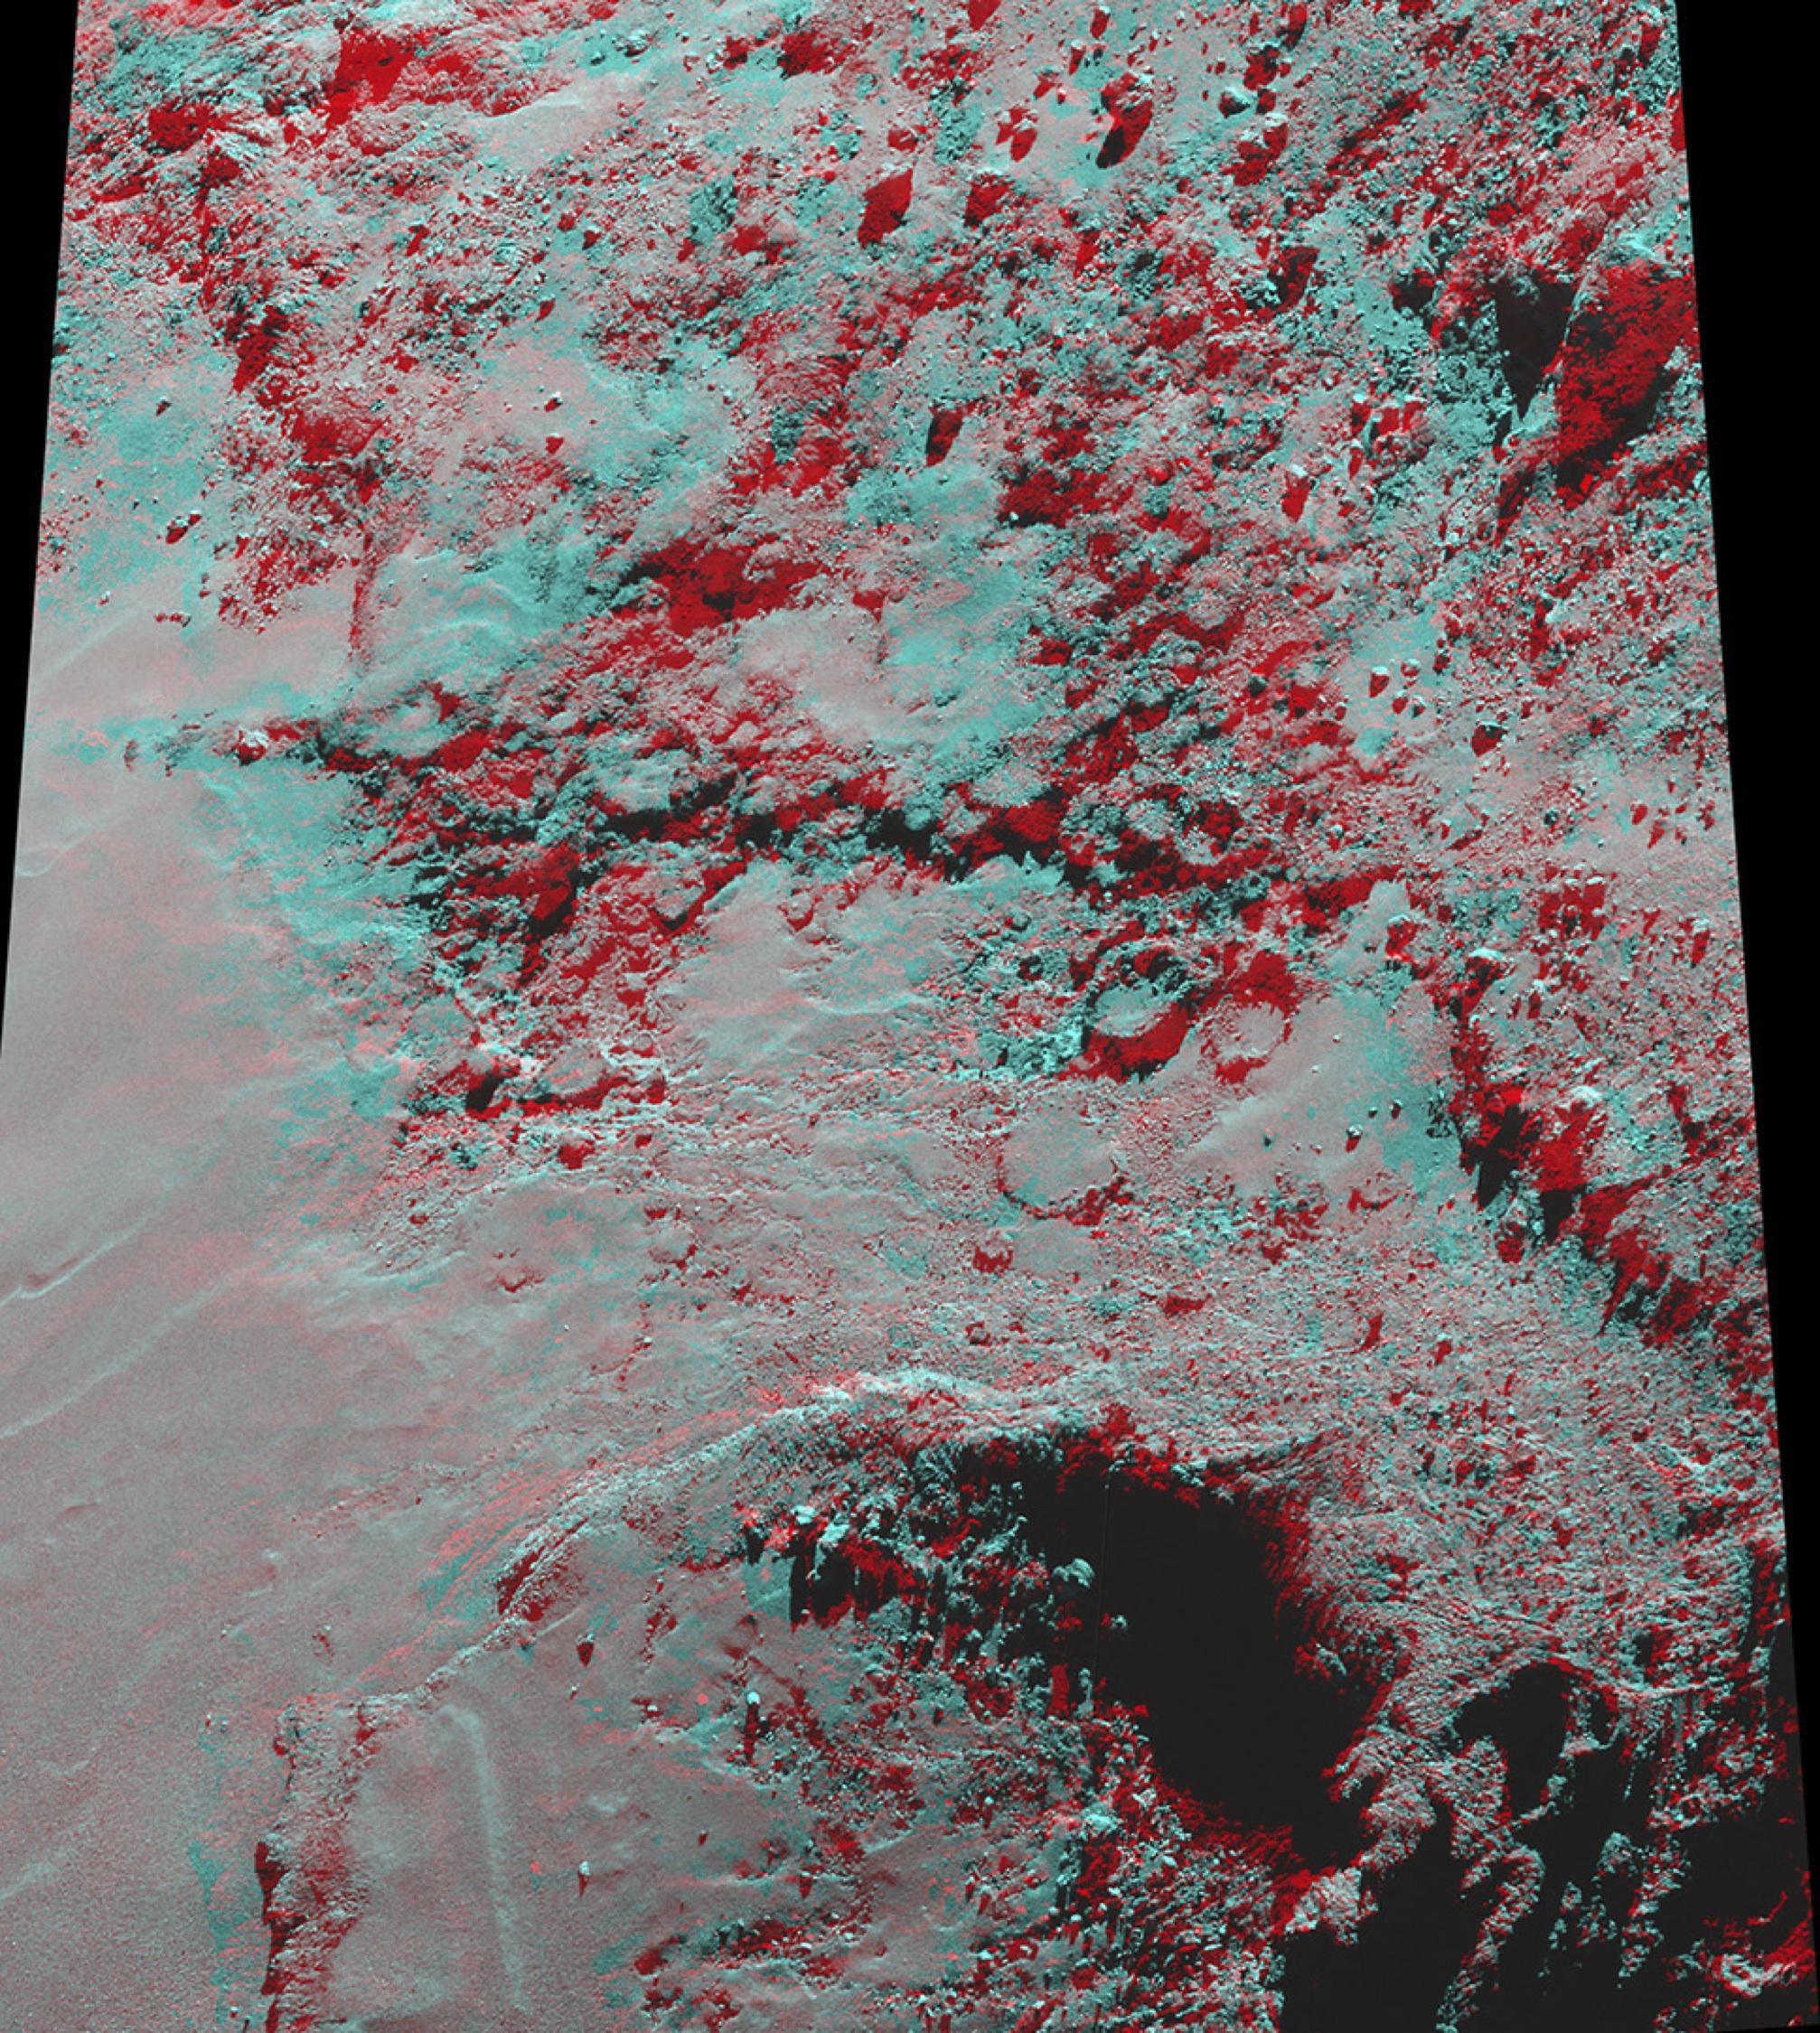 http://www.esa.int/var/esa/storage/images/esa_multimedia/images/2015/07/imhotep_3d/15527930-1-eng-GB/Imhotep_3D.jpg